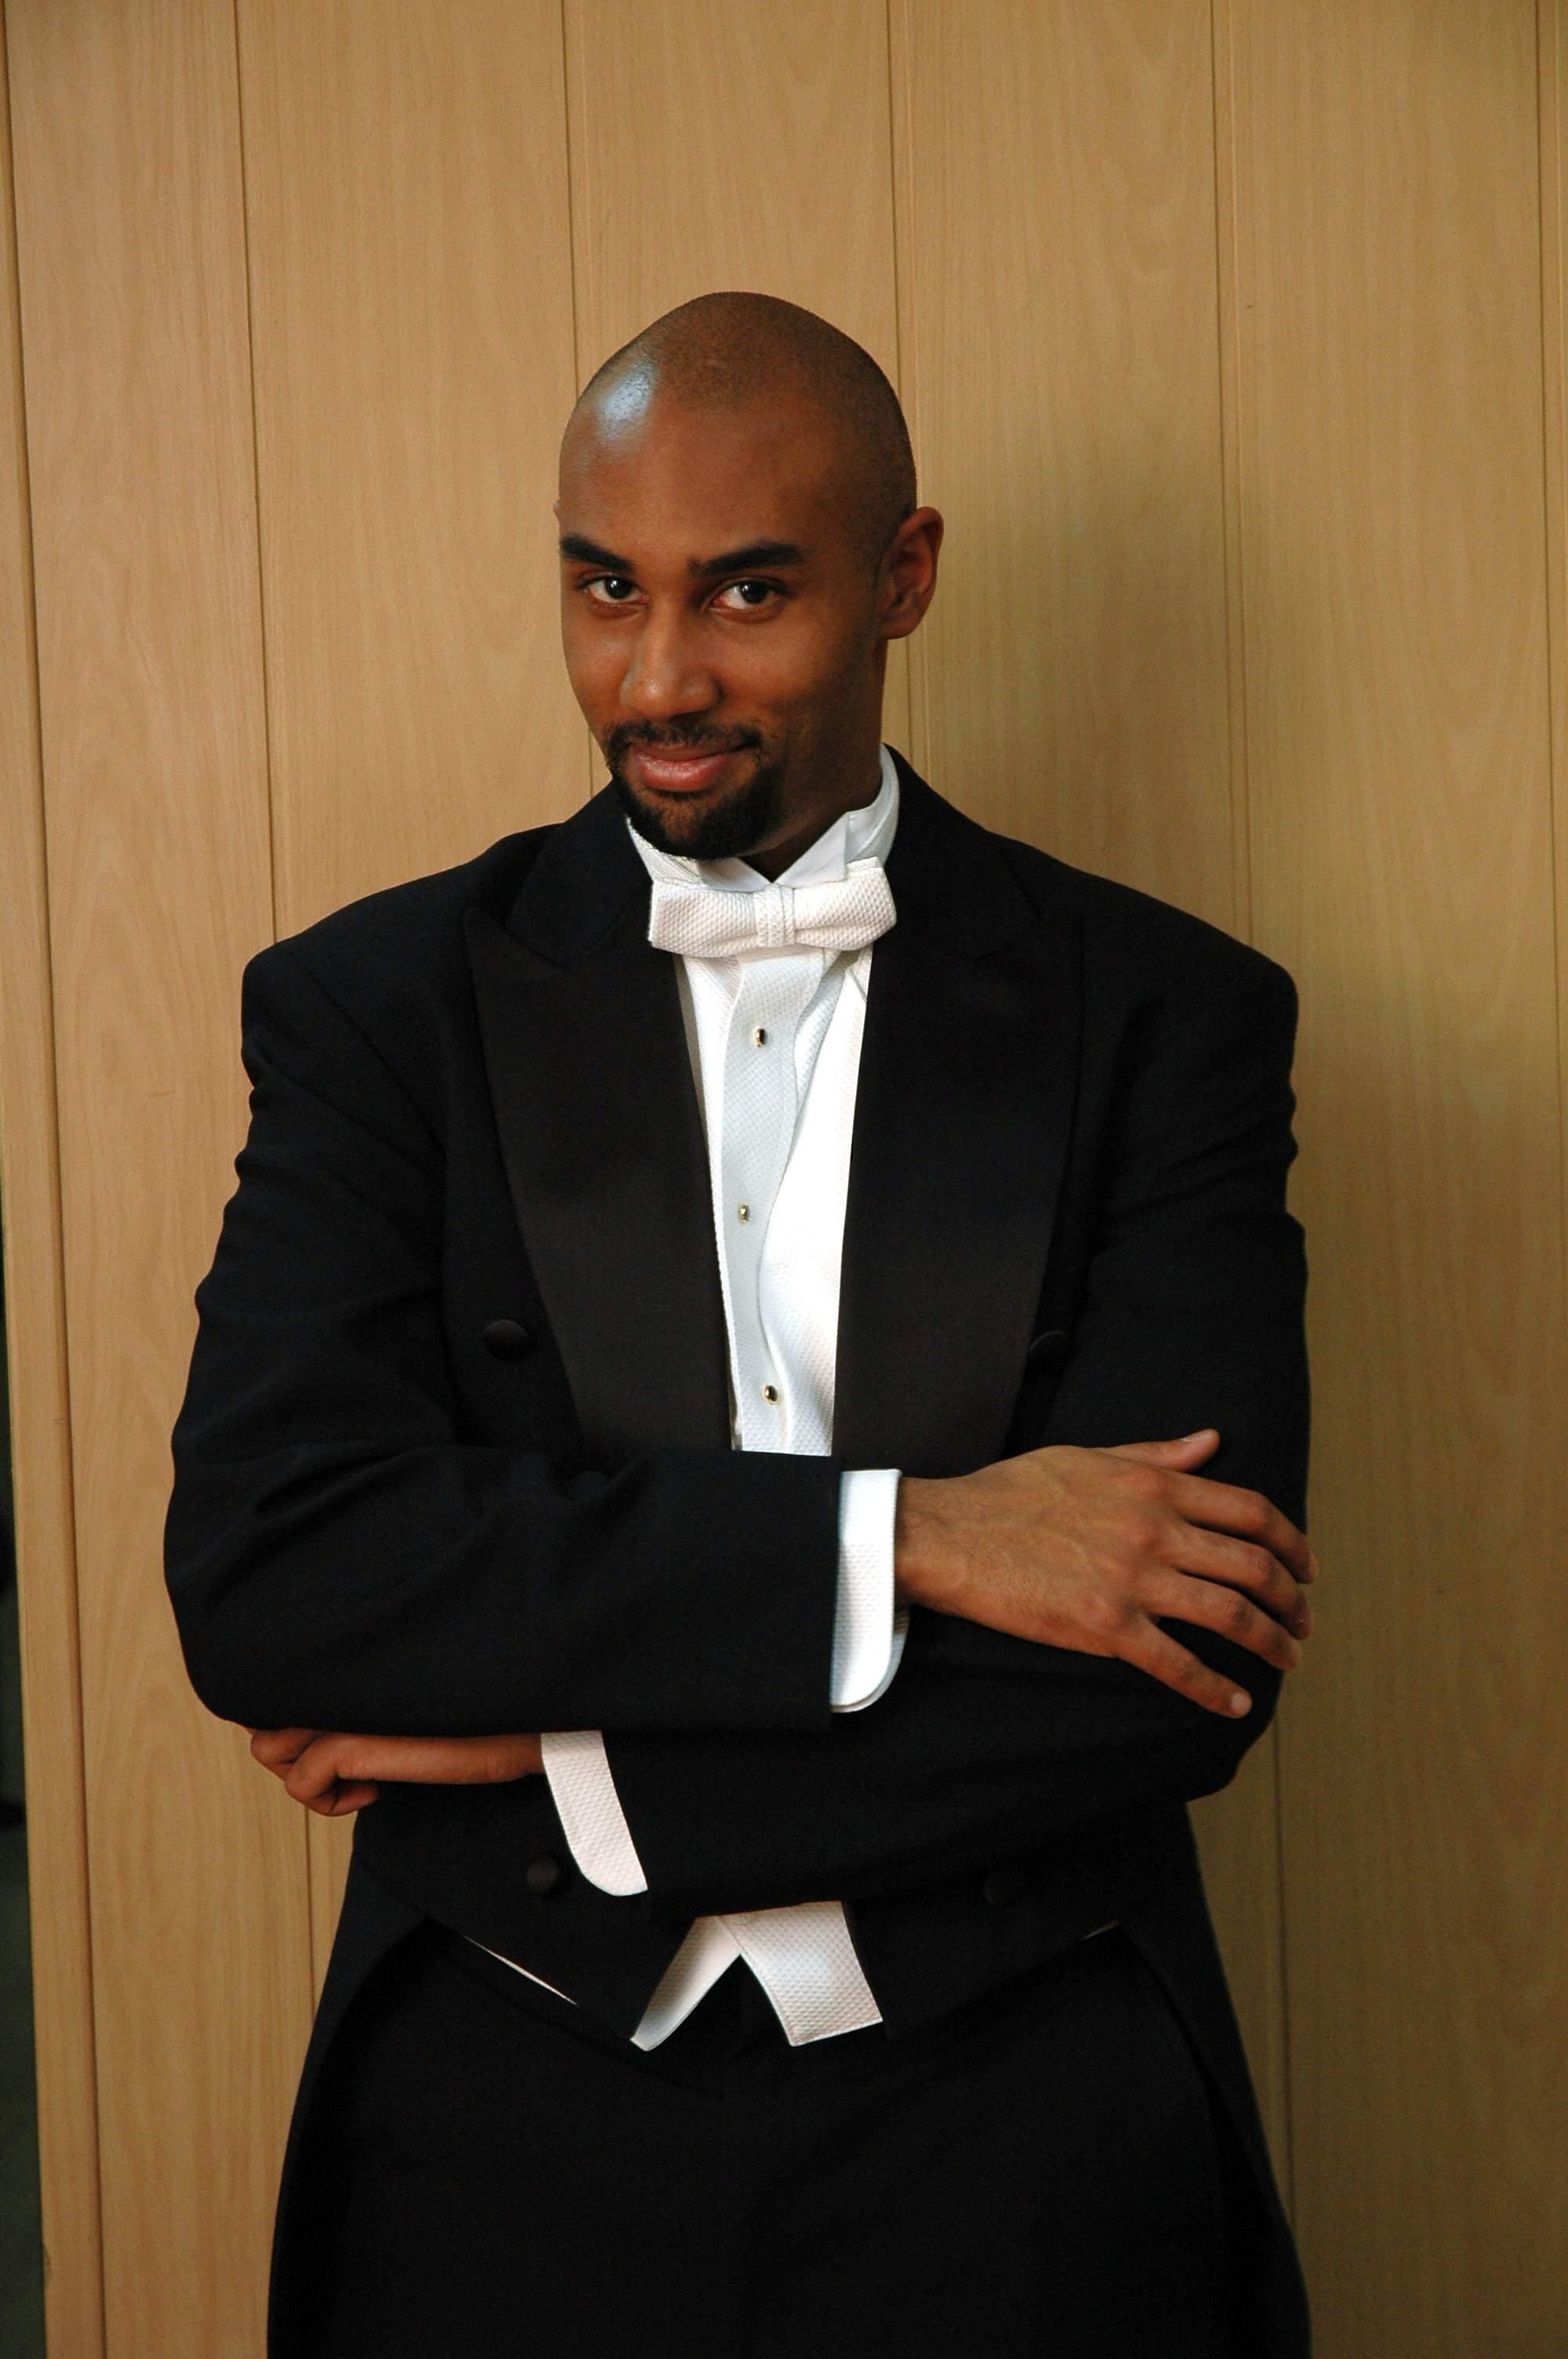 Joseph Jones, conductor